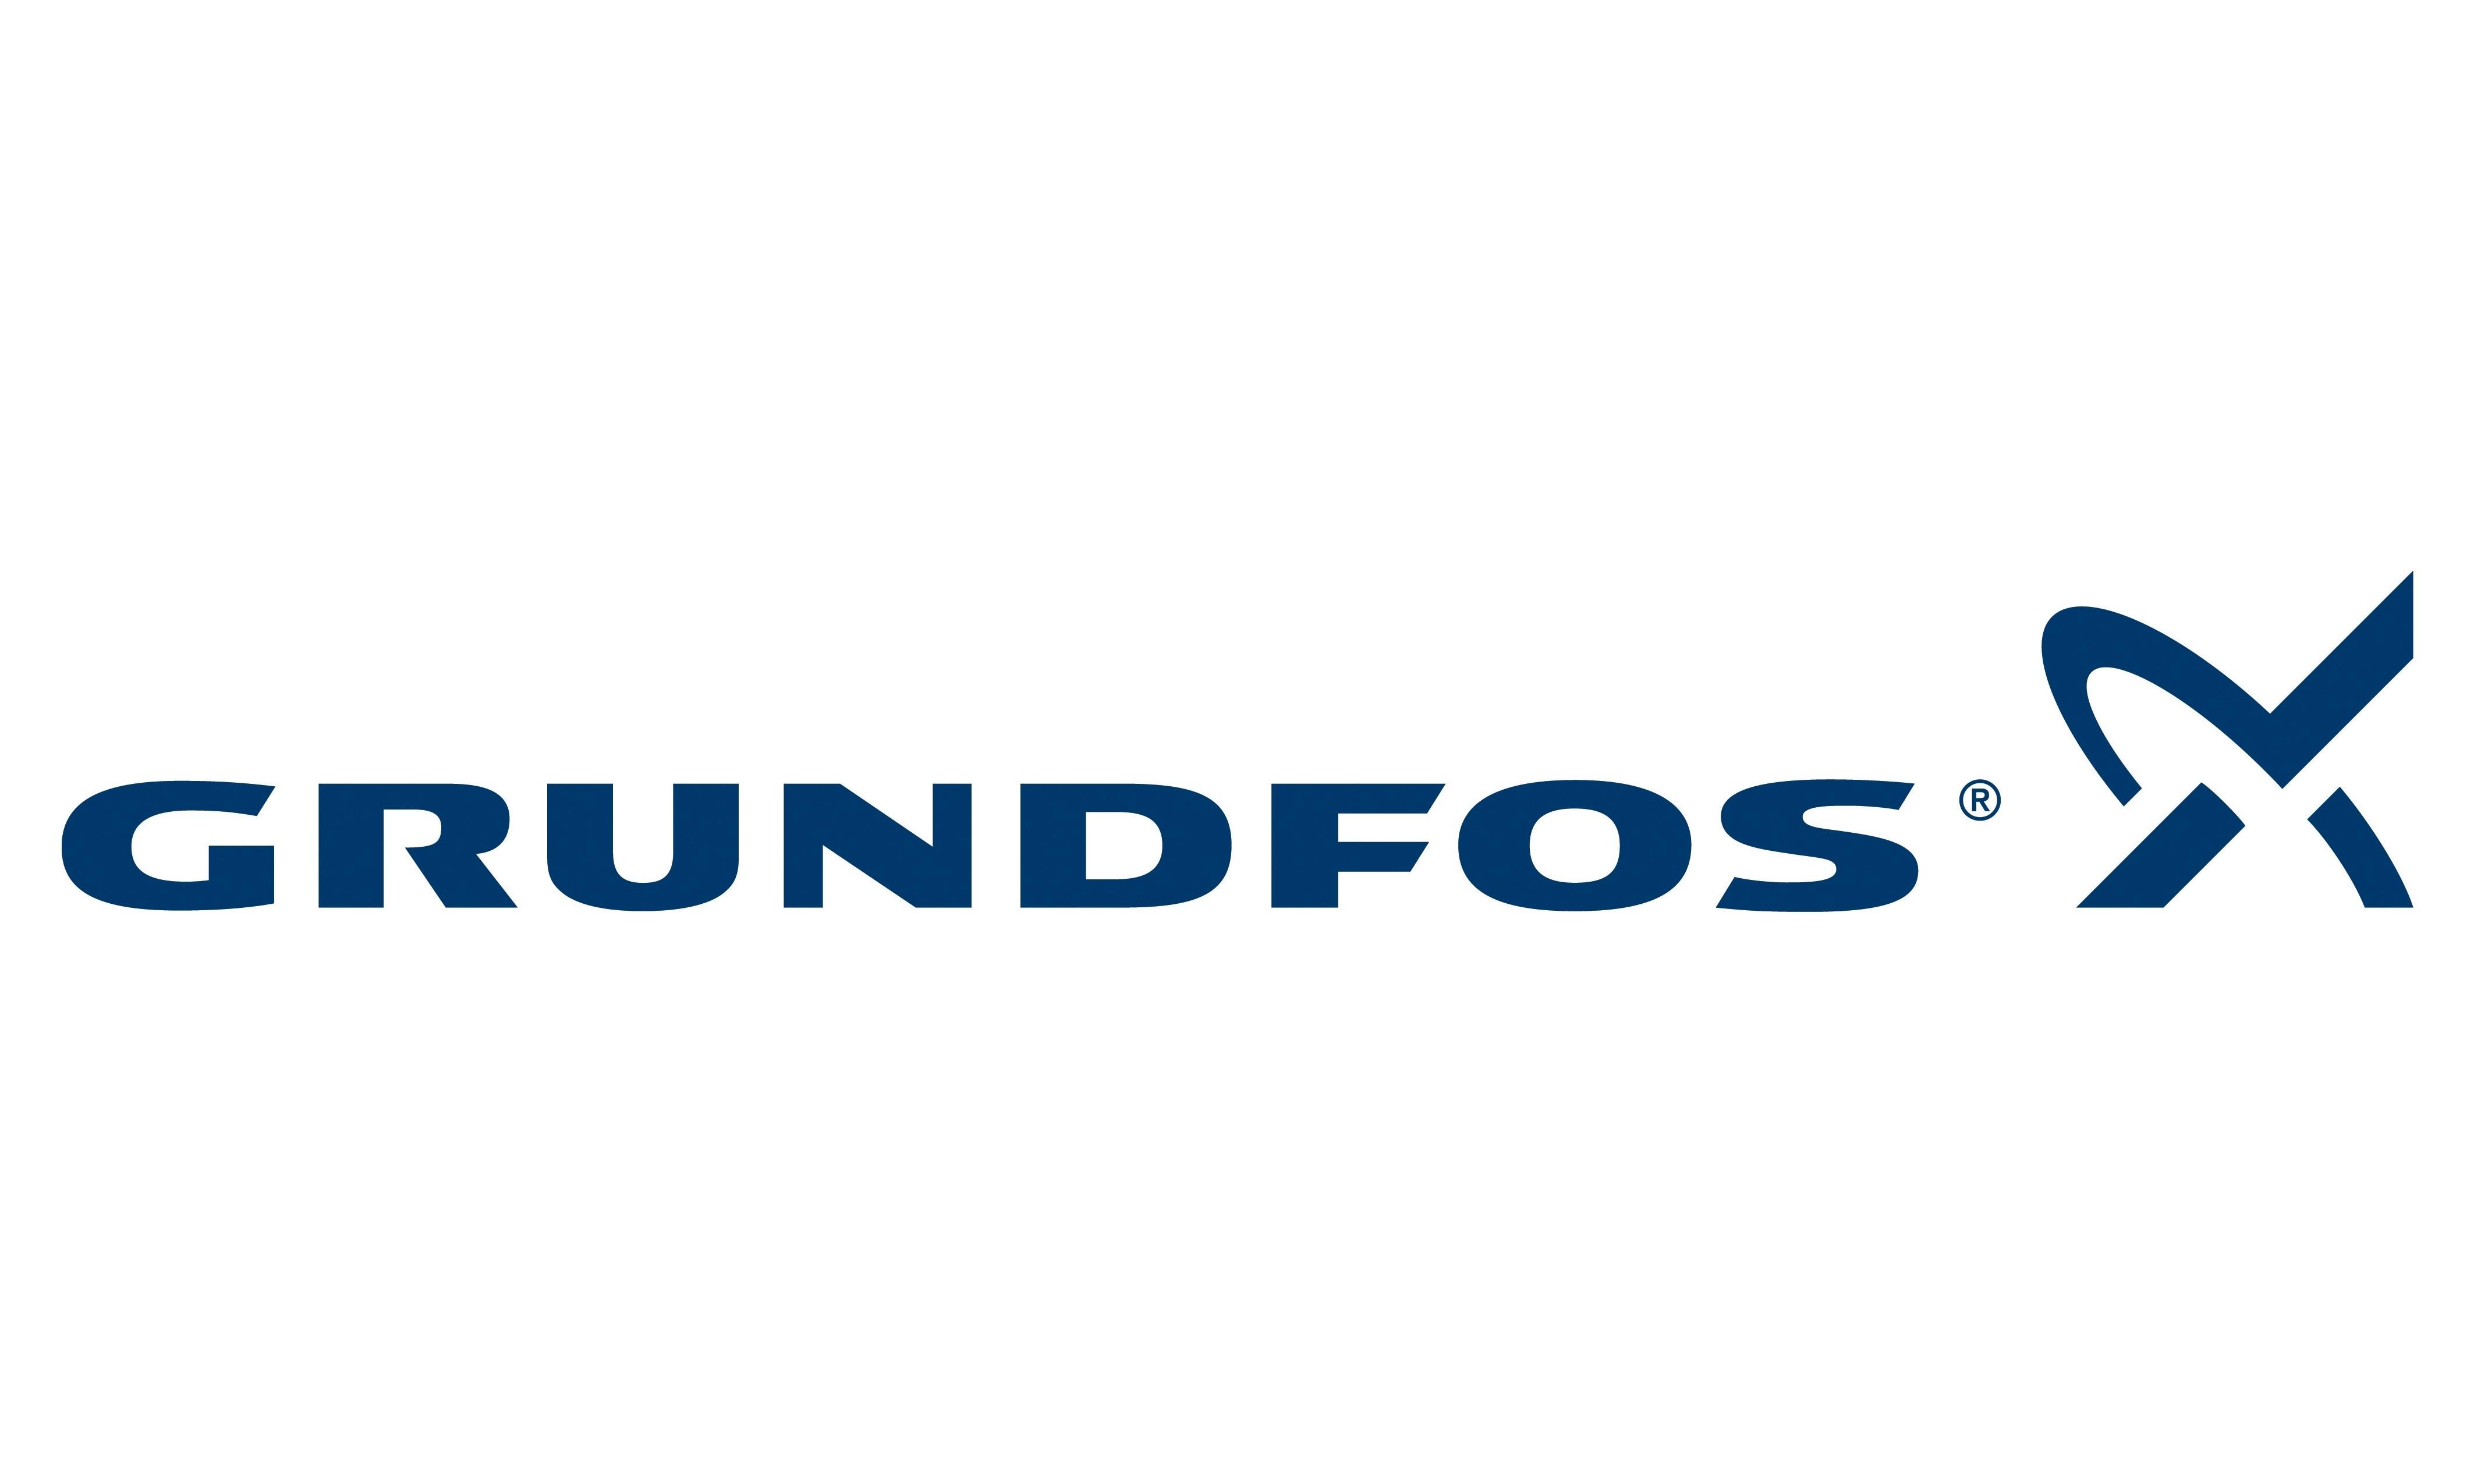 Grundfos Logo Wallpaper